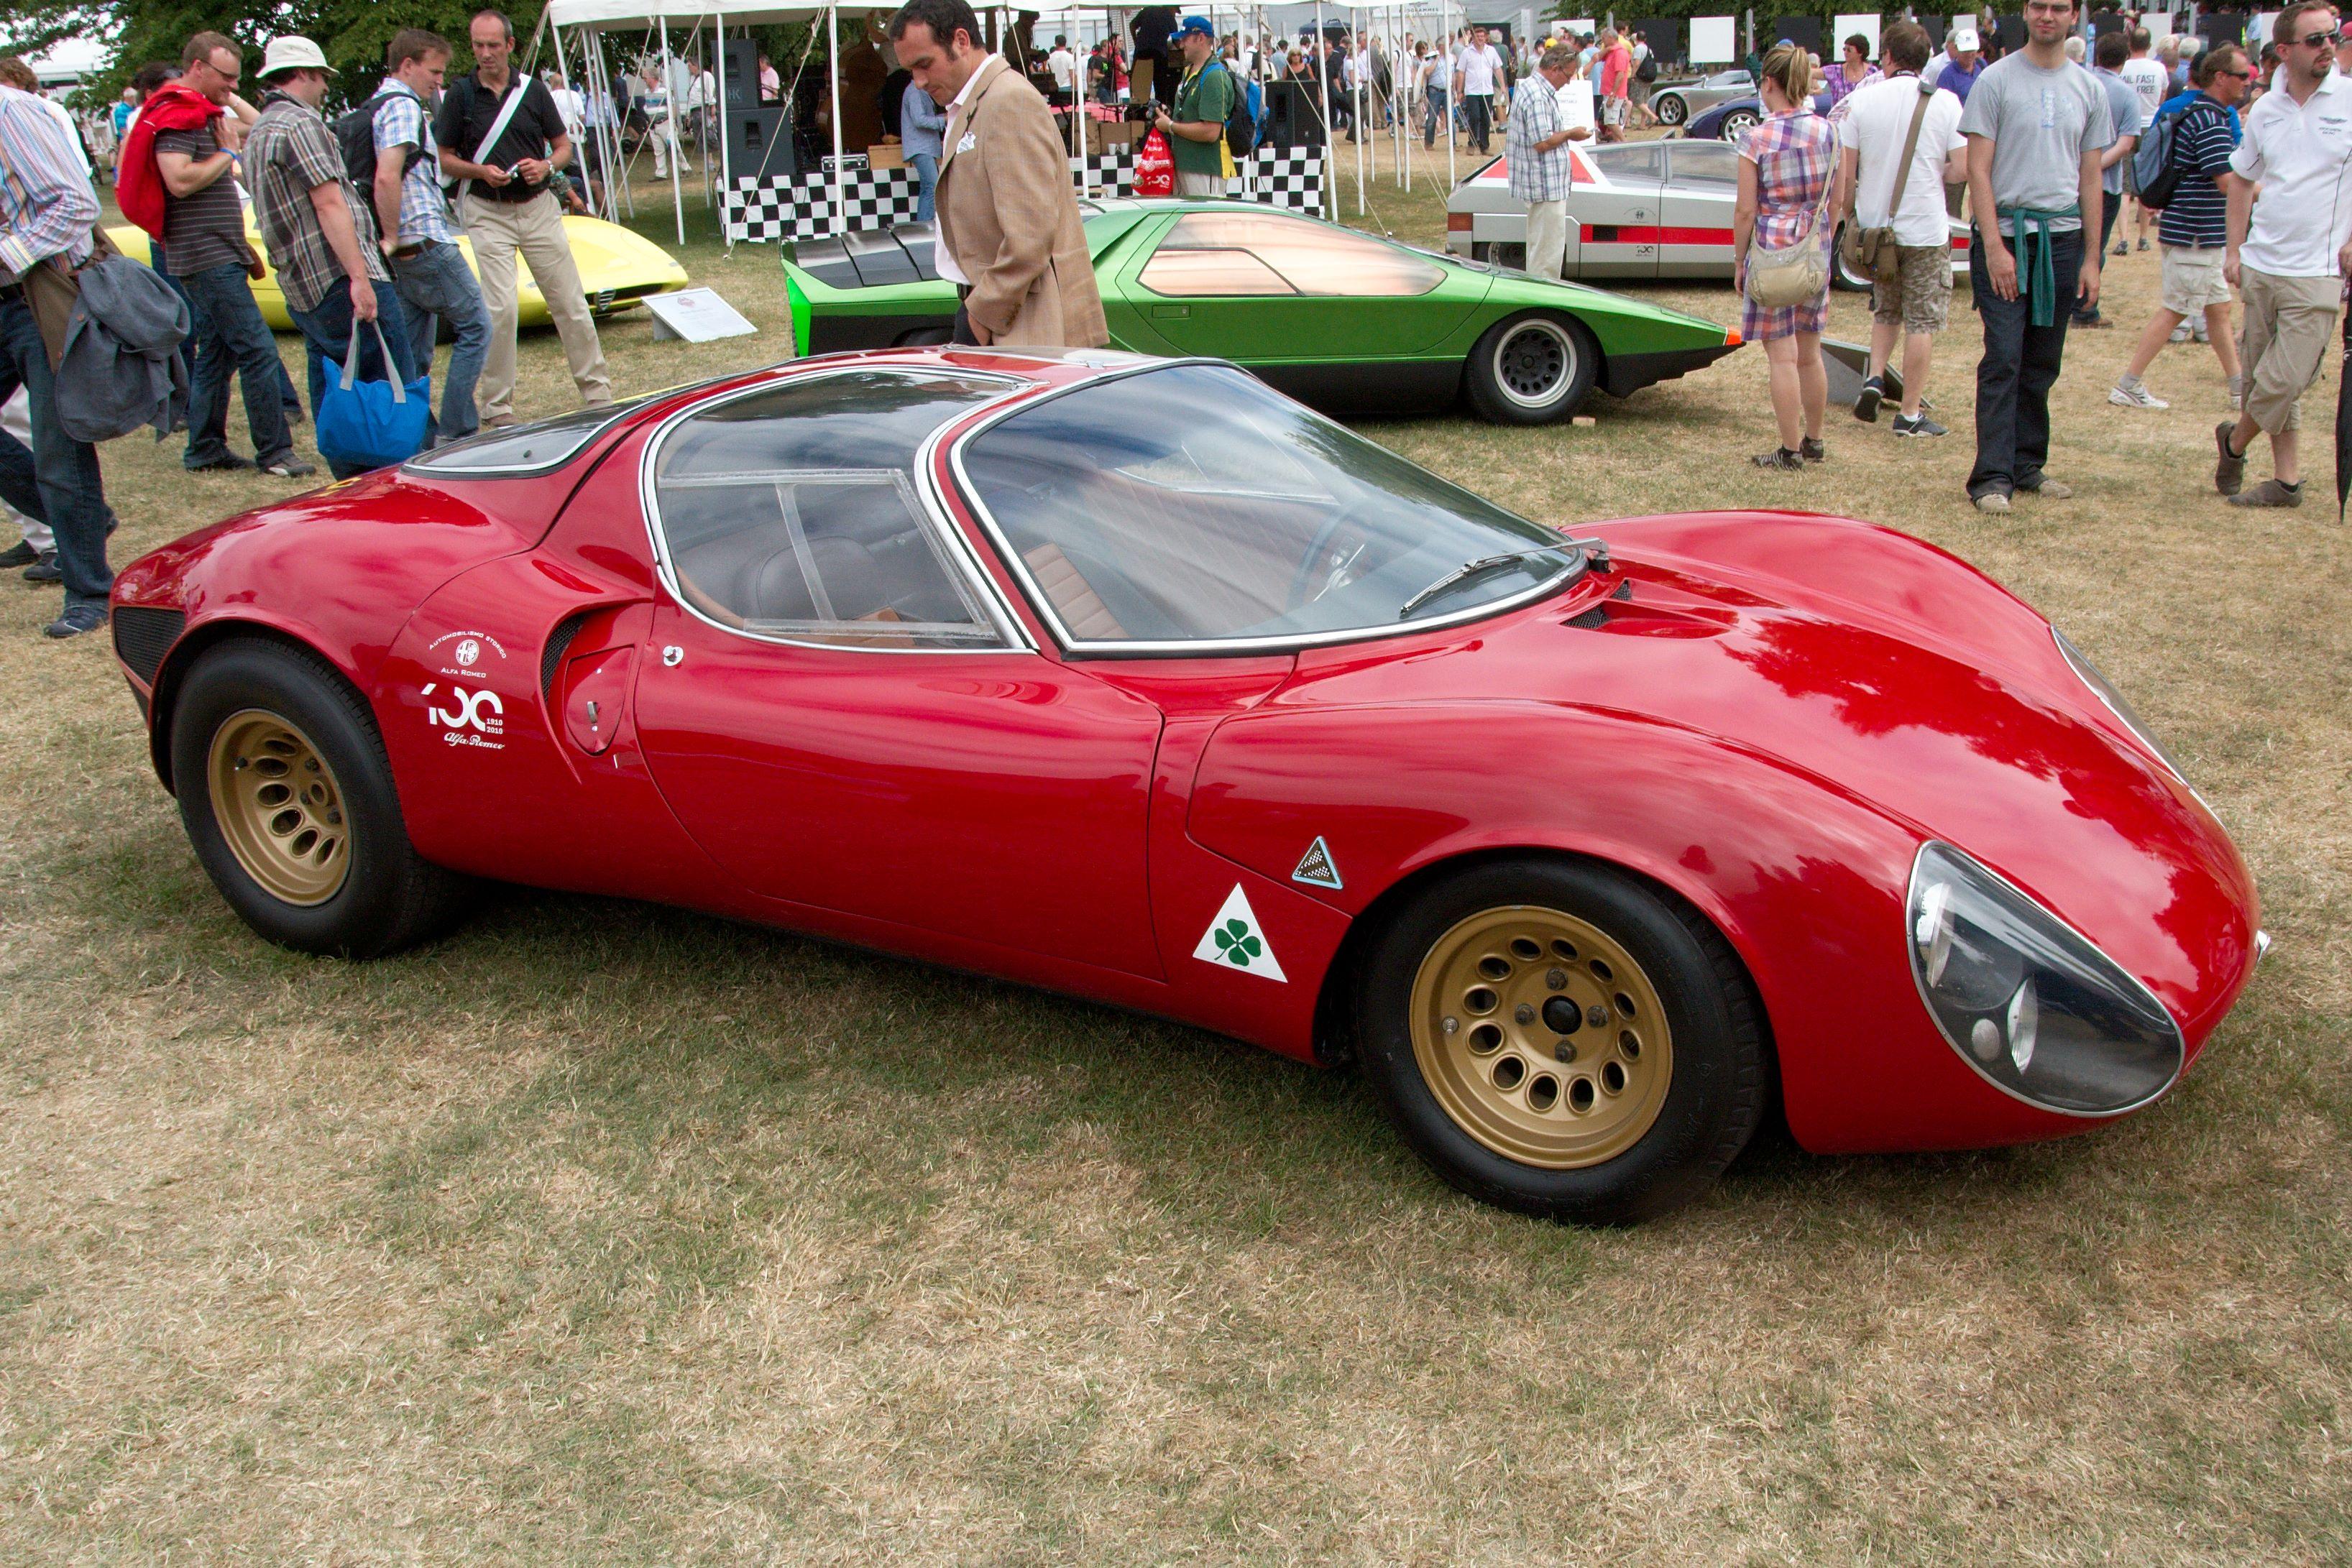 File:Alfa Romeo 33 Stradale 1967 - Flickr - andrewbasterfield (1).jpg - Wikimedia Commons